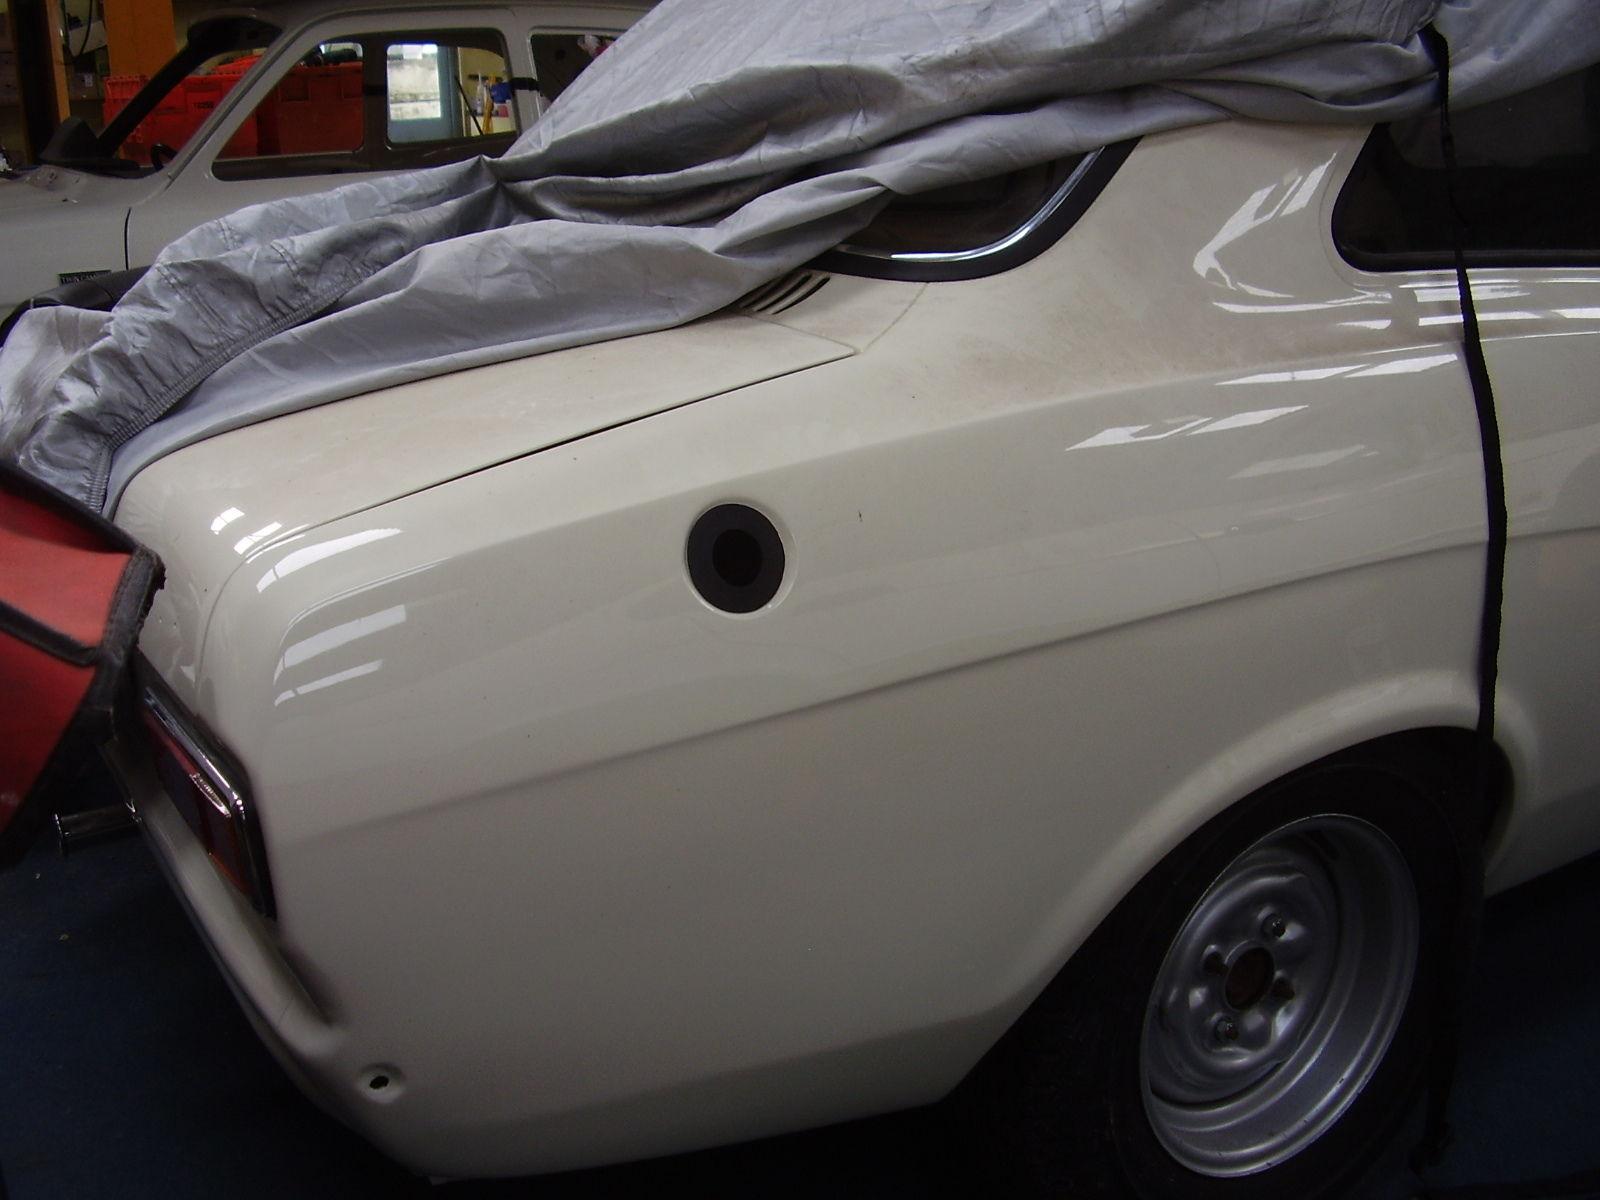 68 / 69 Twin Cam Petrol Tank Filler Neck Rubber